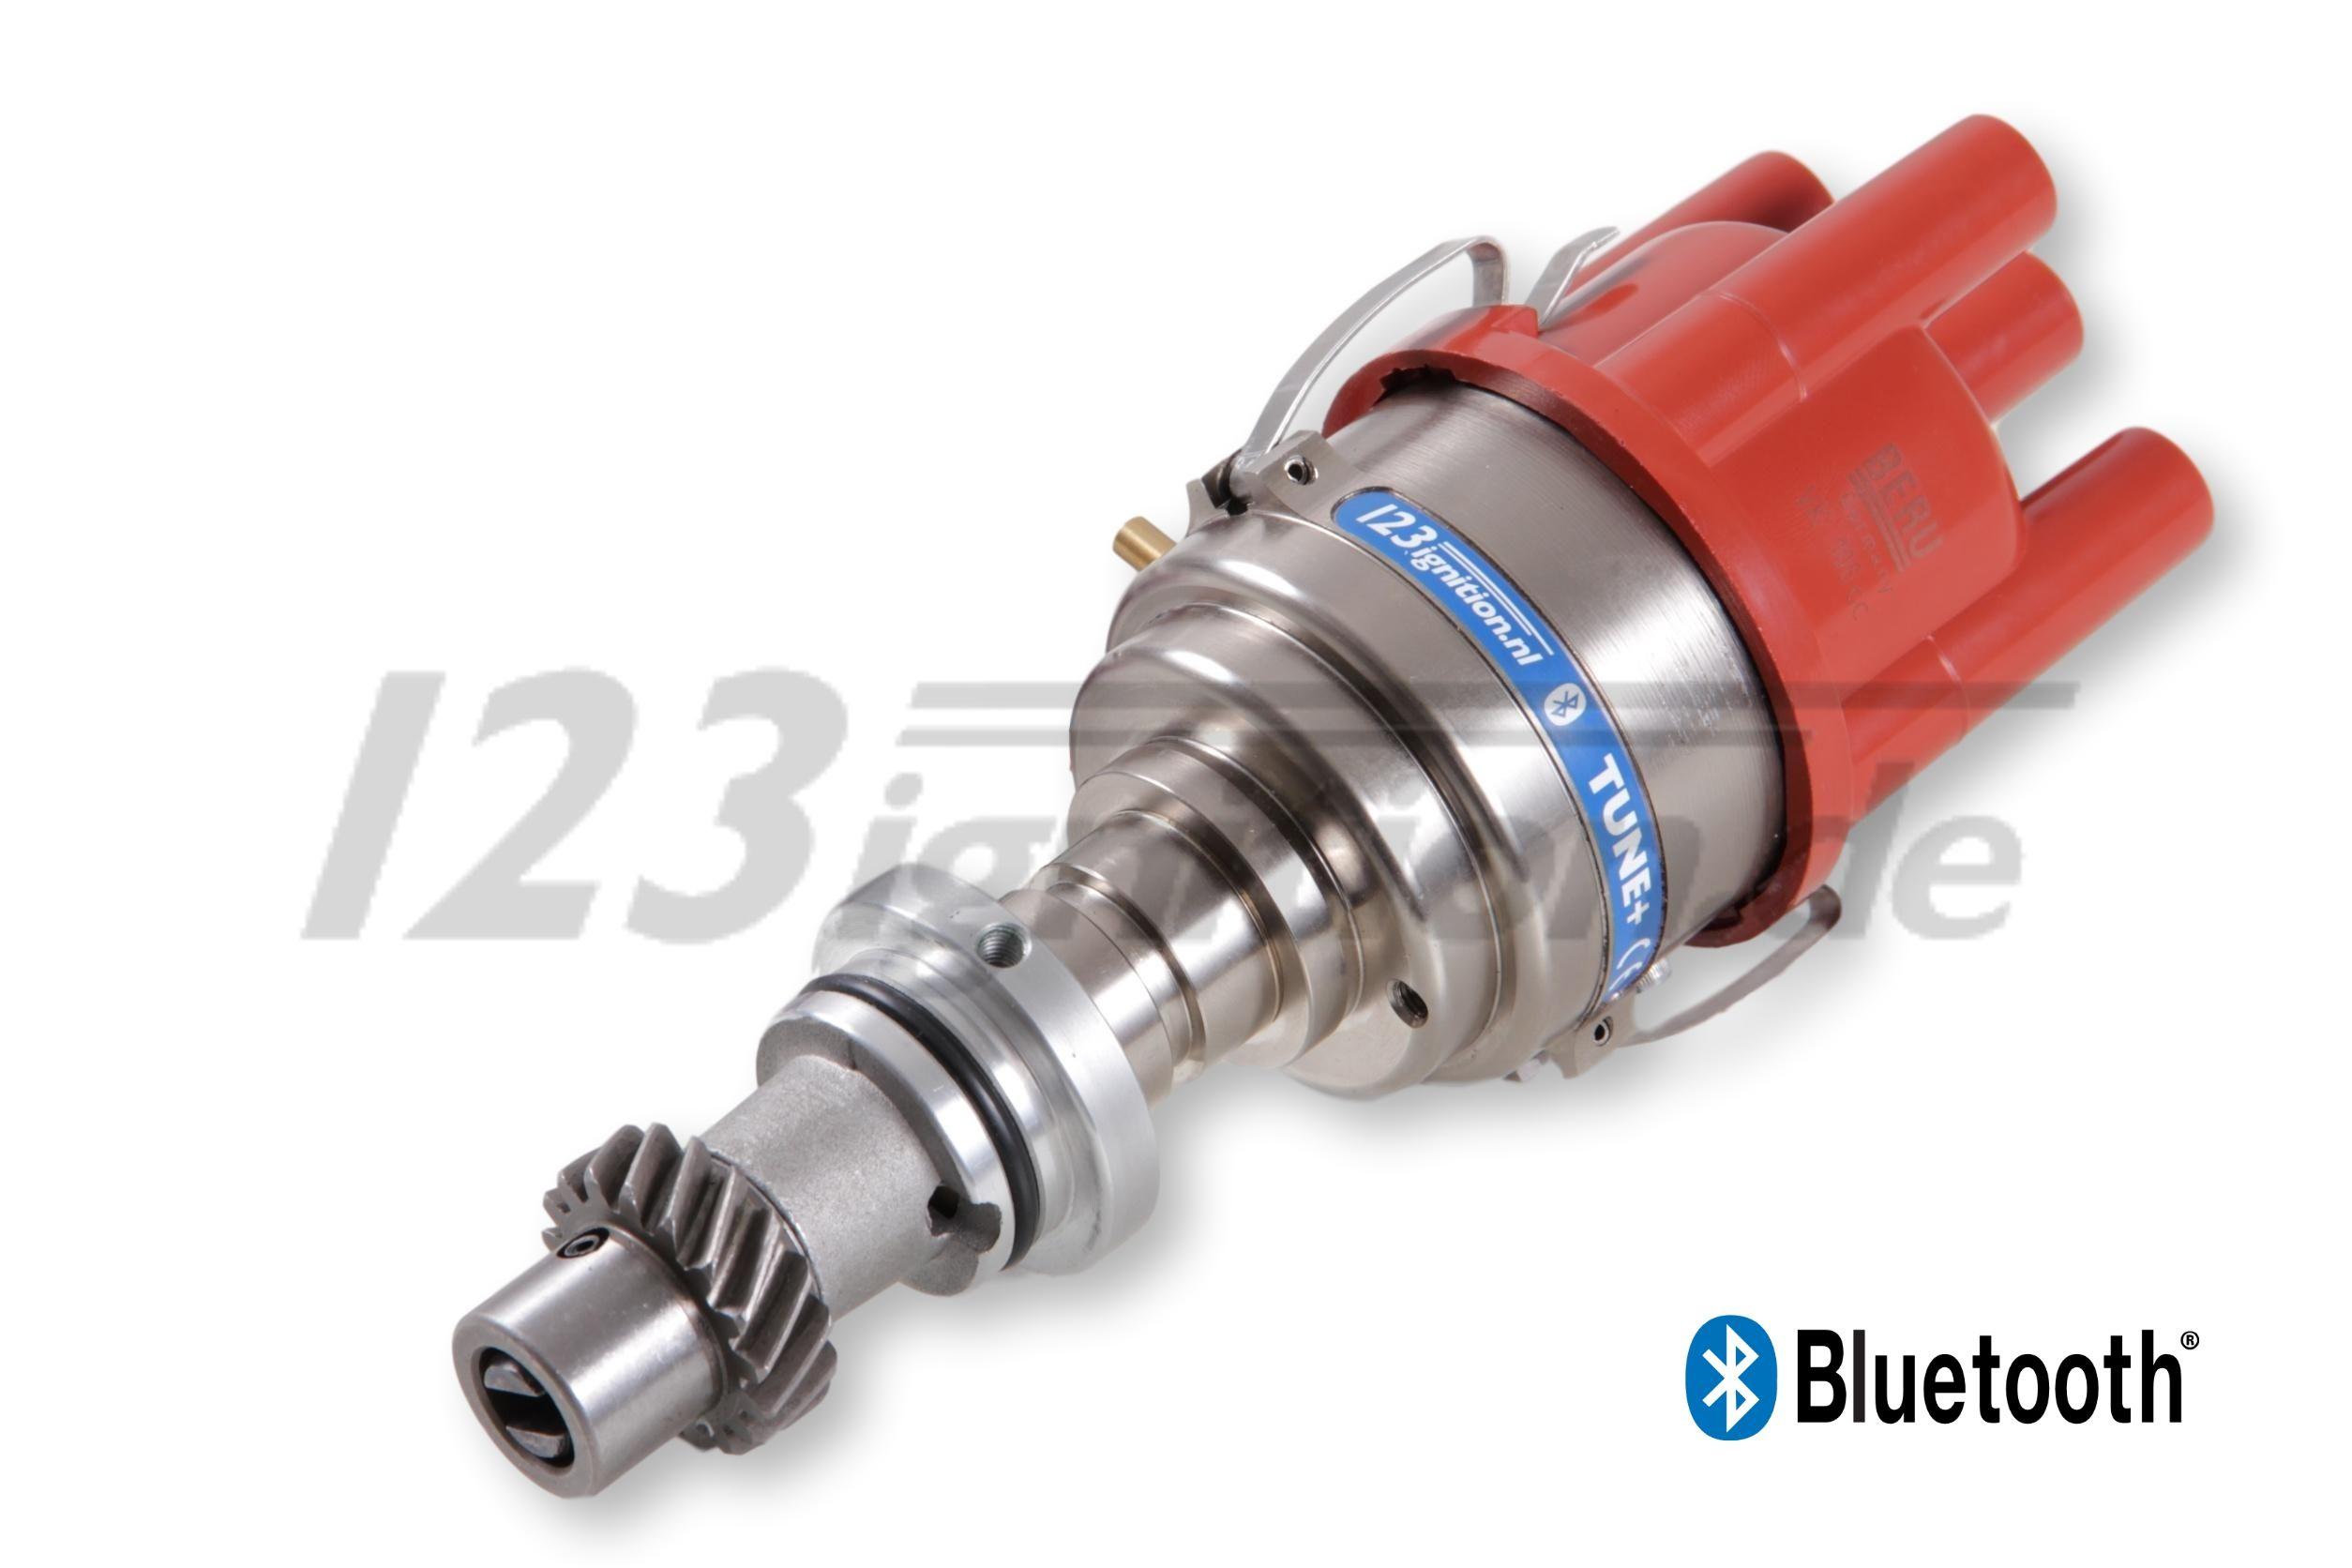 123\TUNE+ Bluetooth ontsteking verdeler voor VW Audi 8V 827 Motor